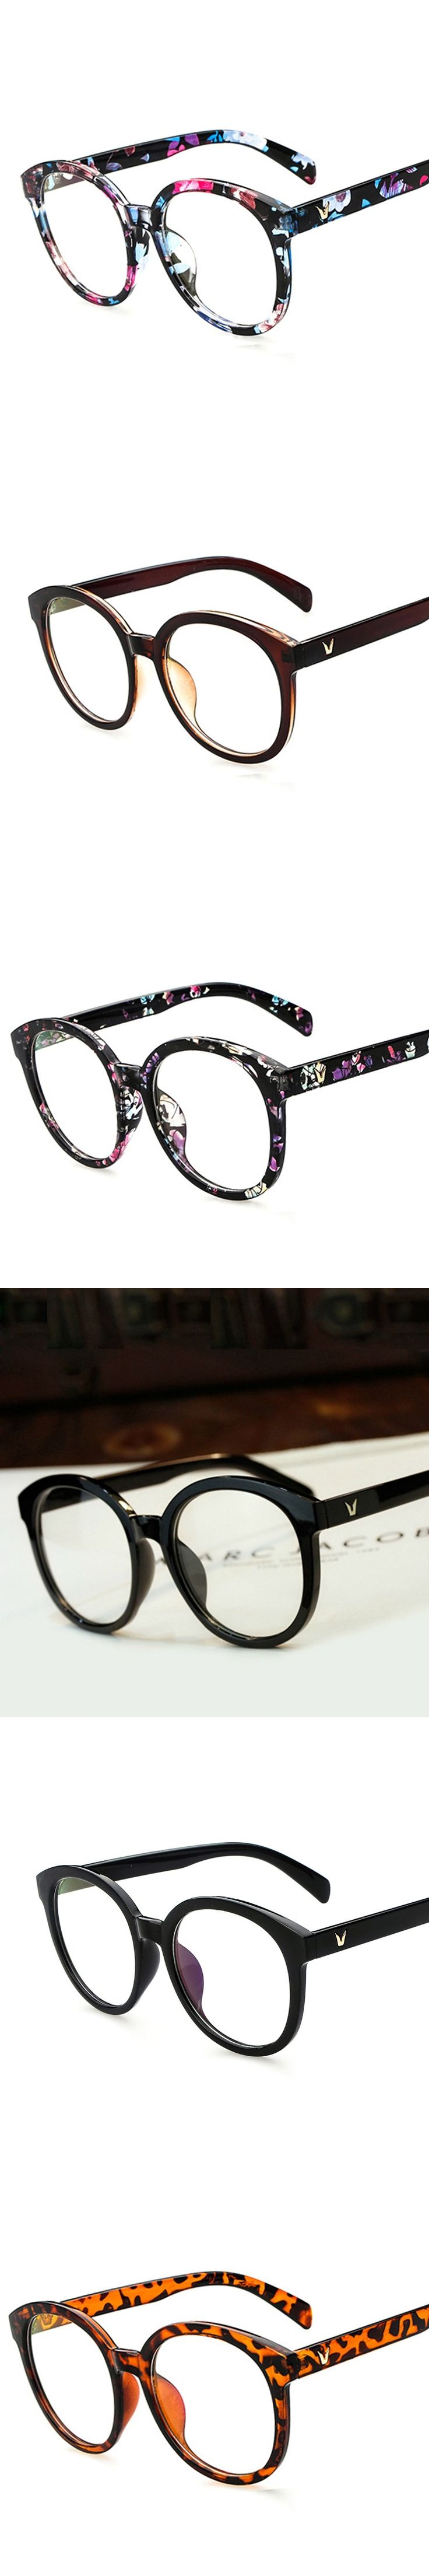 2017 Big Myopia Glasses Frame Vintage Clear Eyeglasses Optical Spectacle Prescription Eyeglass Frames Women Men Oculos Eyewear